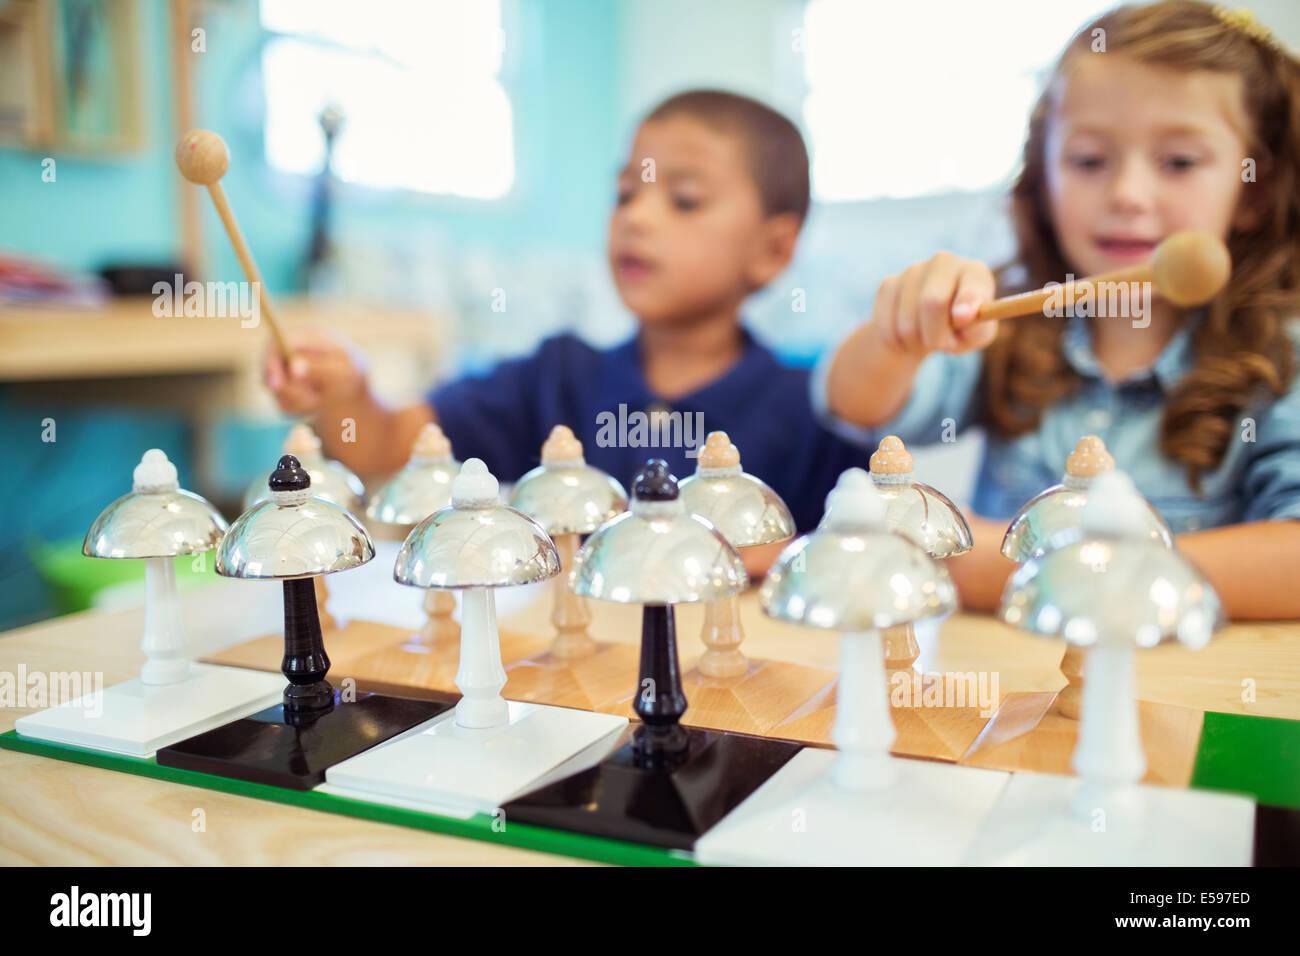 Studenten spielen Glocken in der Klasse Stockbild